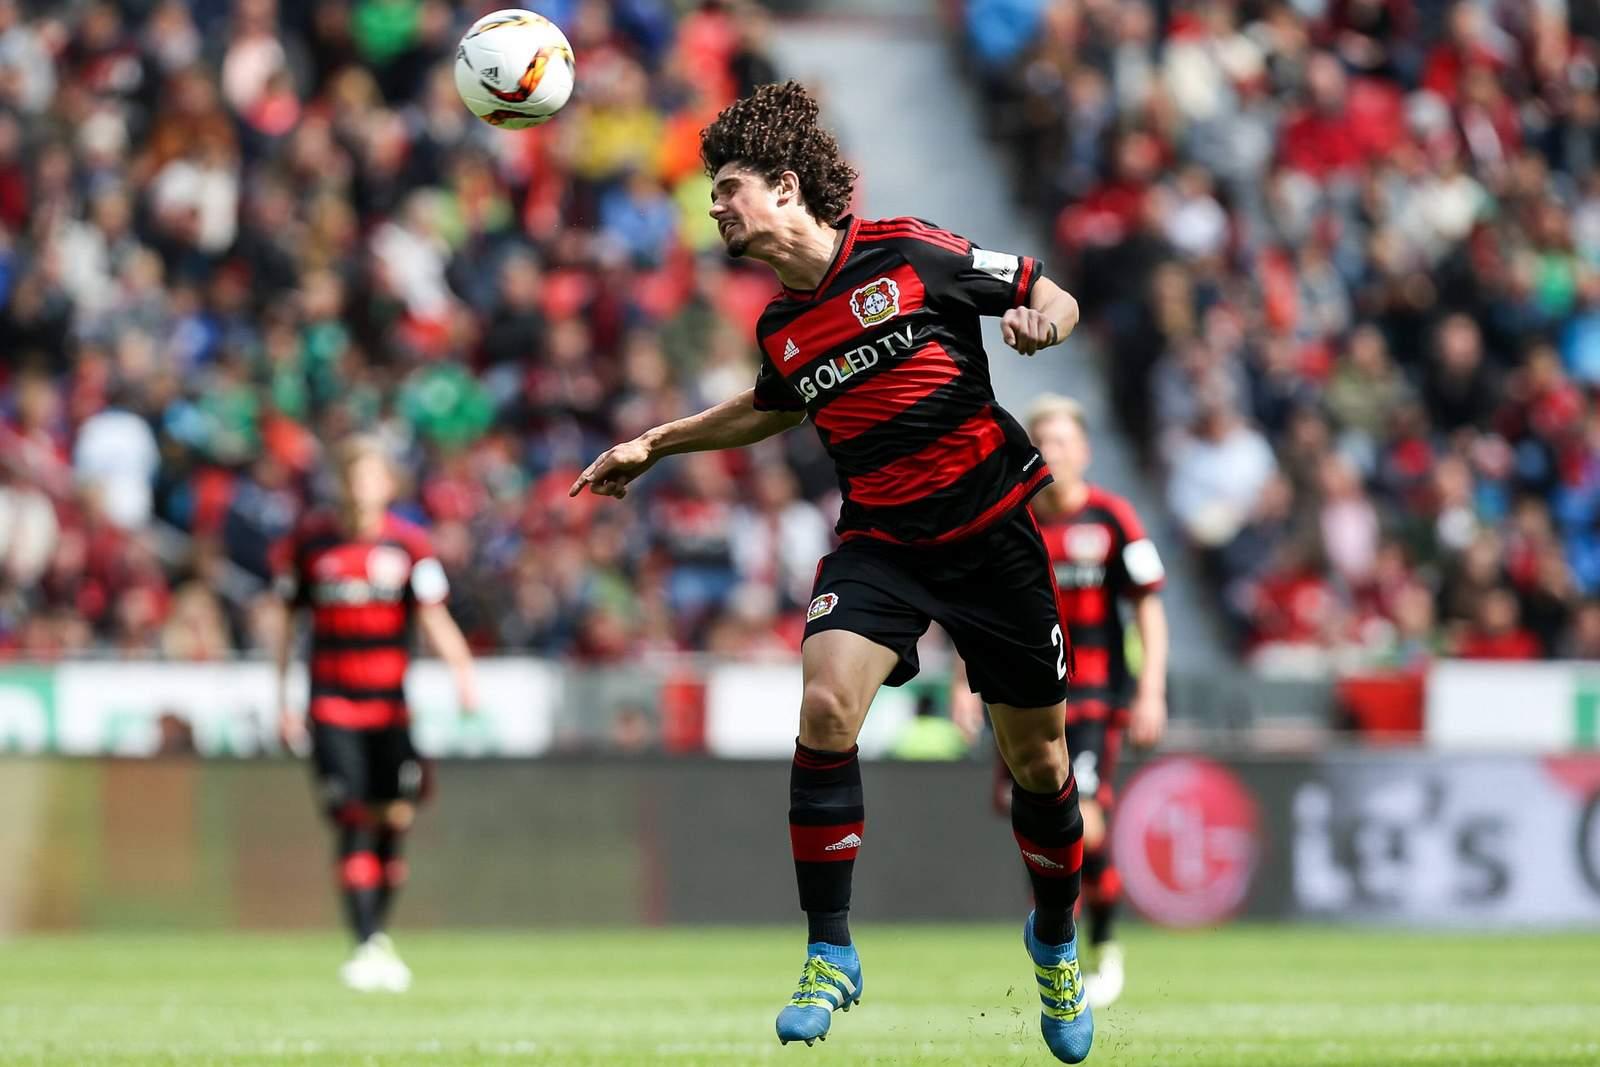 Andre Ramalho von Leverkusen